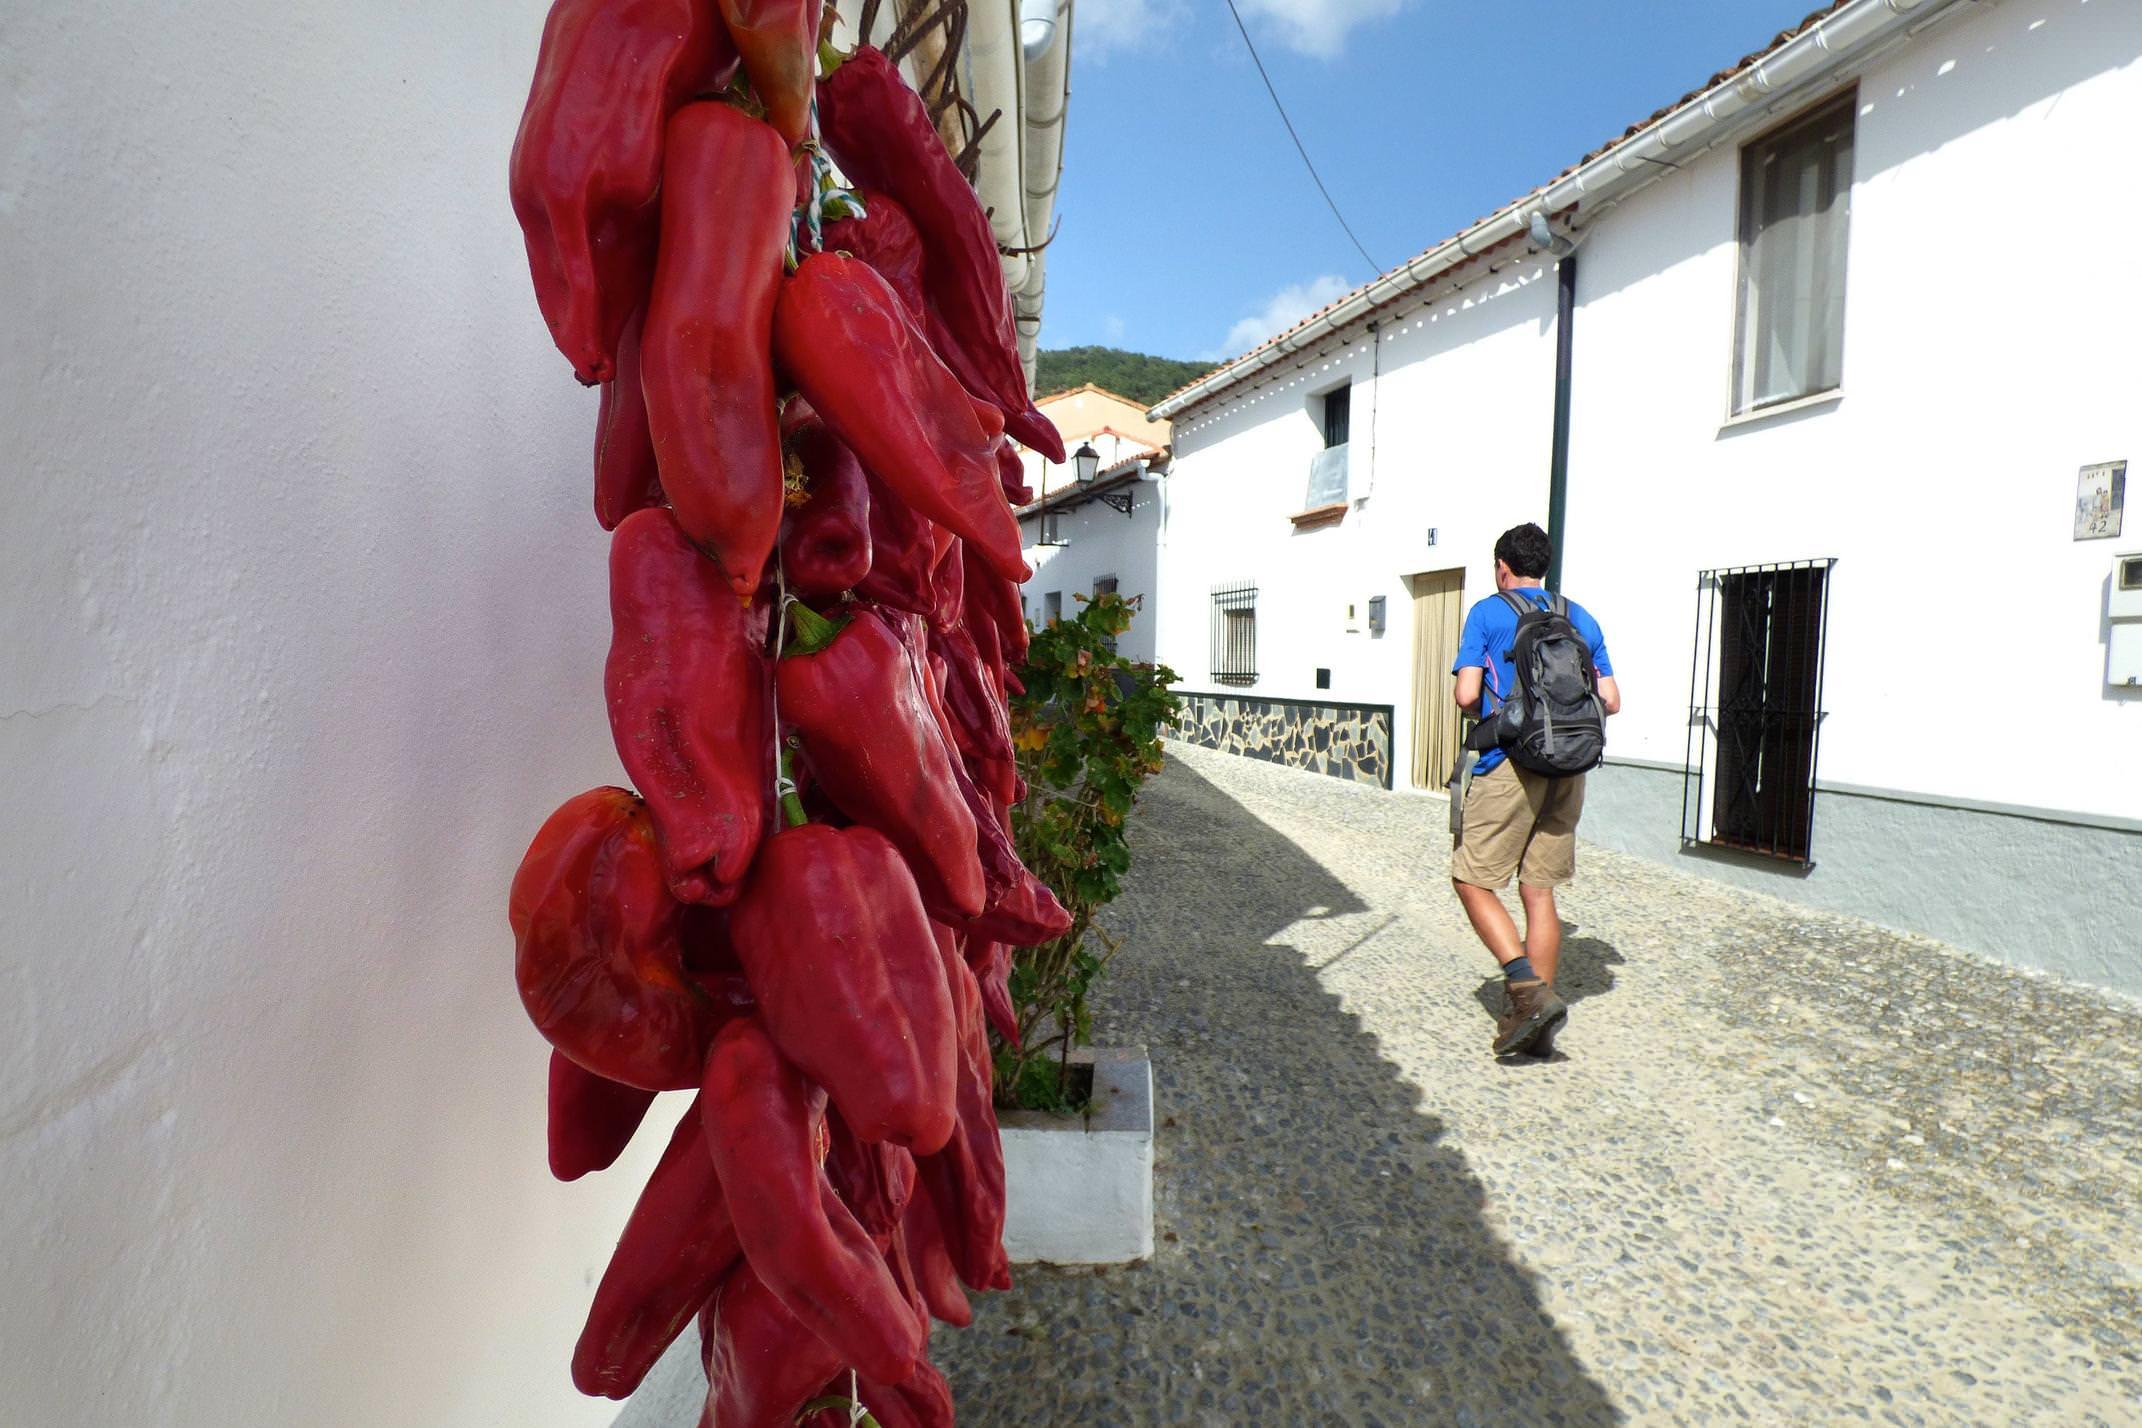 Spain andalucia aracena hills peppers in navahermosa village